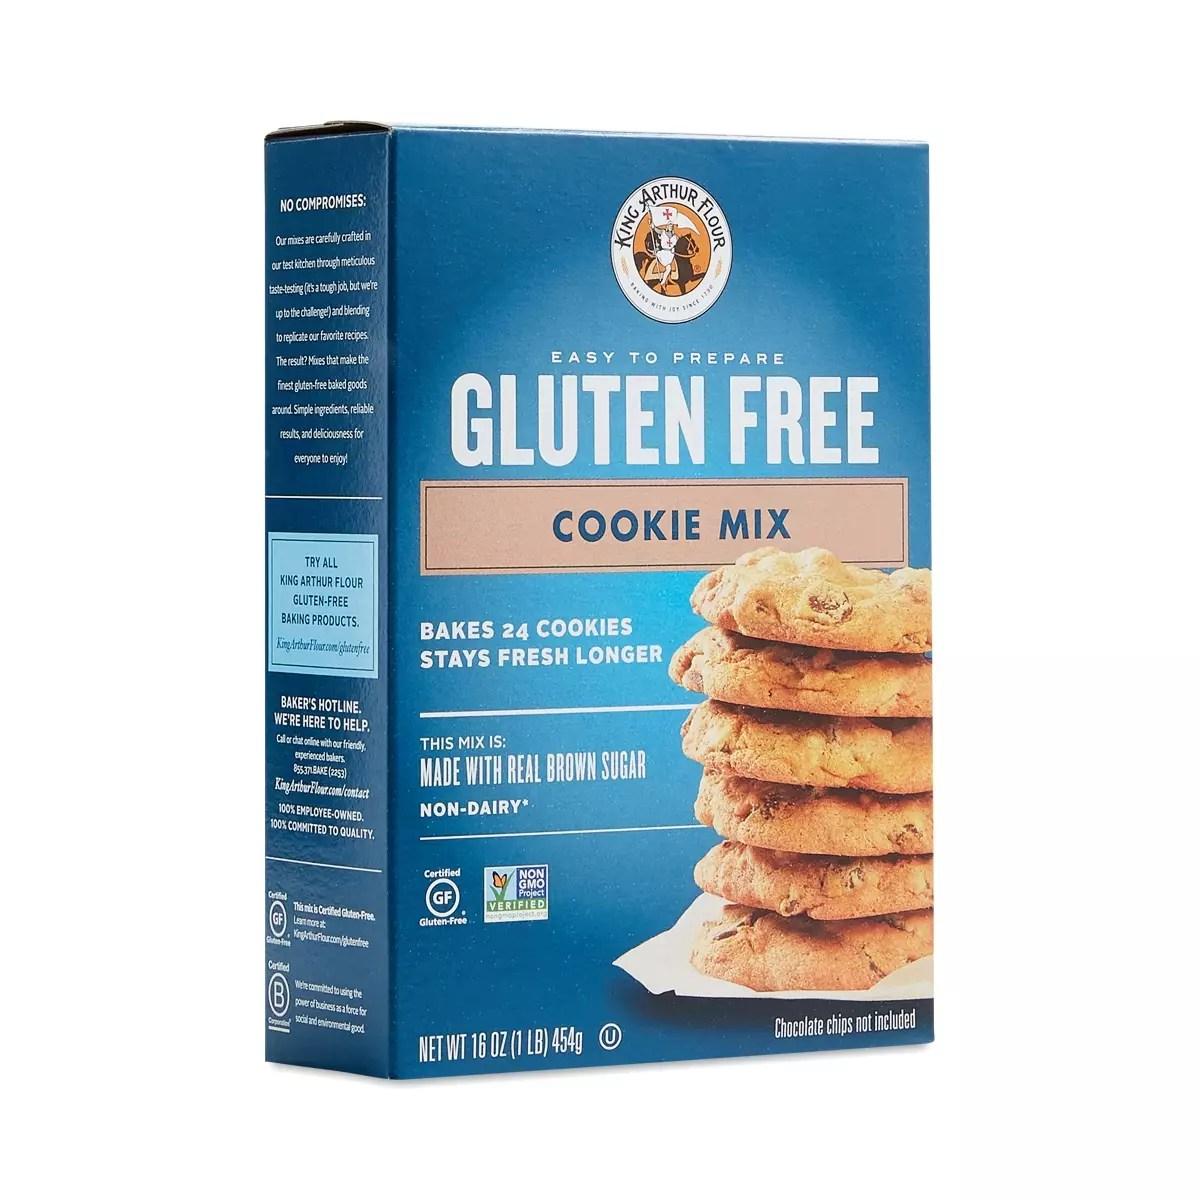 Gluten Free Cookie Mix by King Arthur Flour Thrive Market